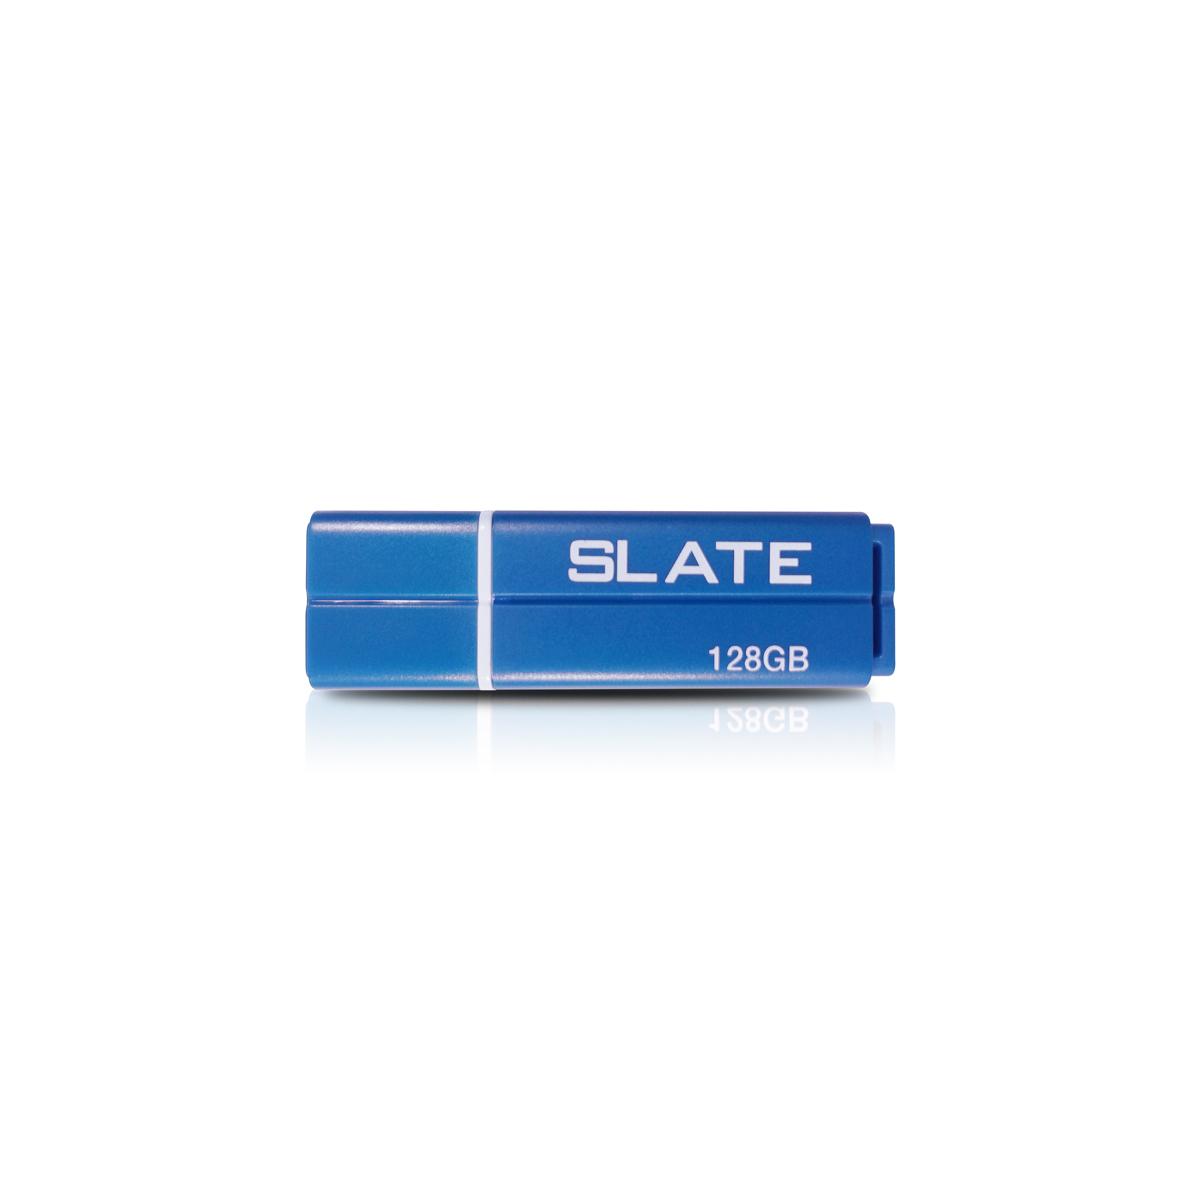 128GB Patriot Slate USB 3.0 modrý